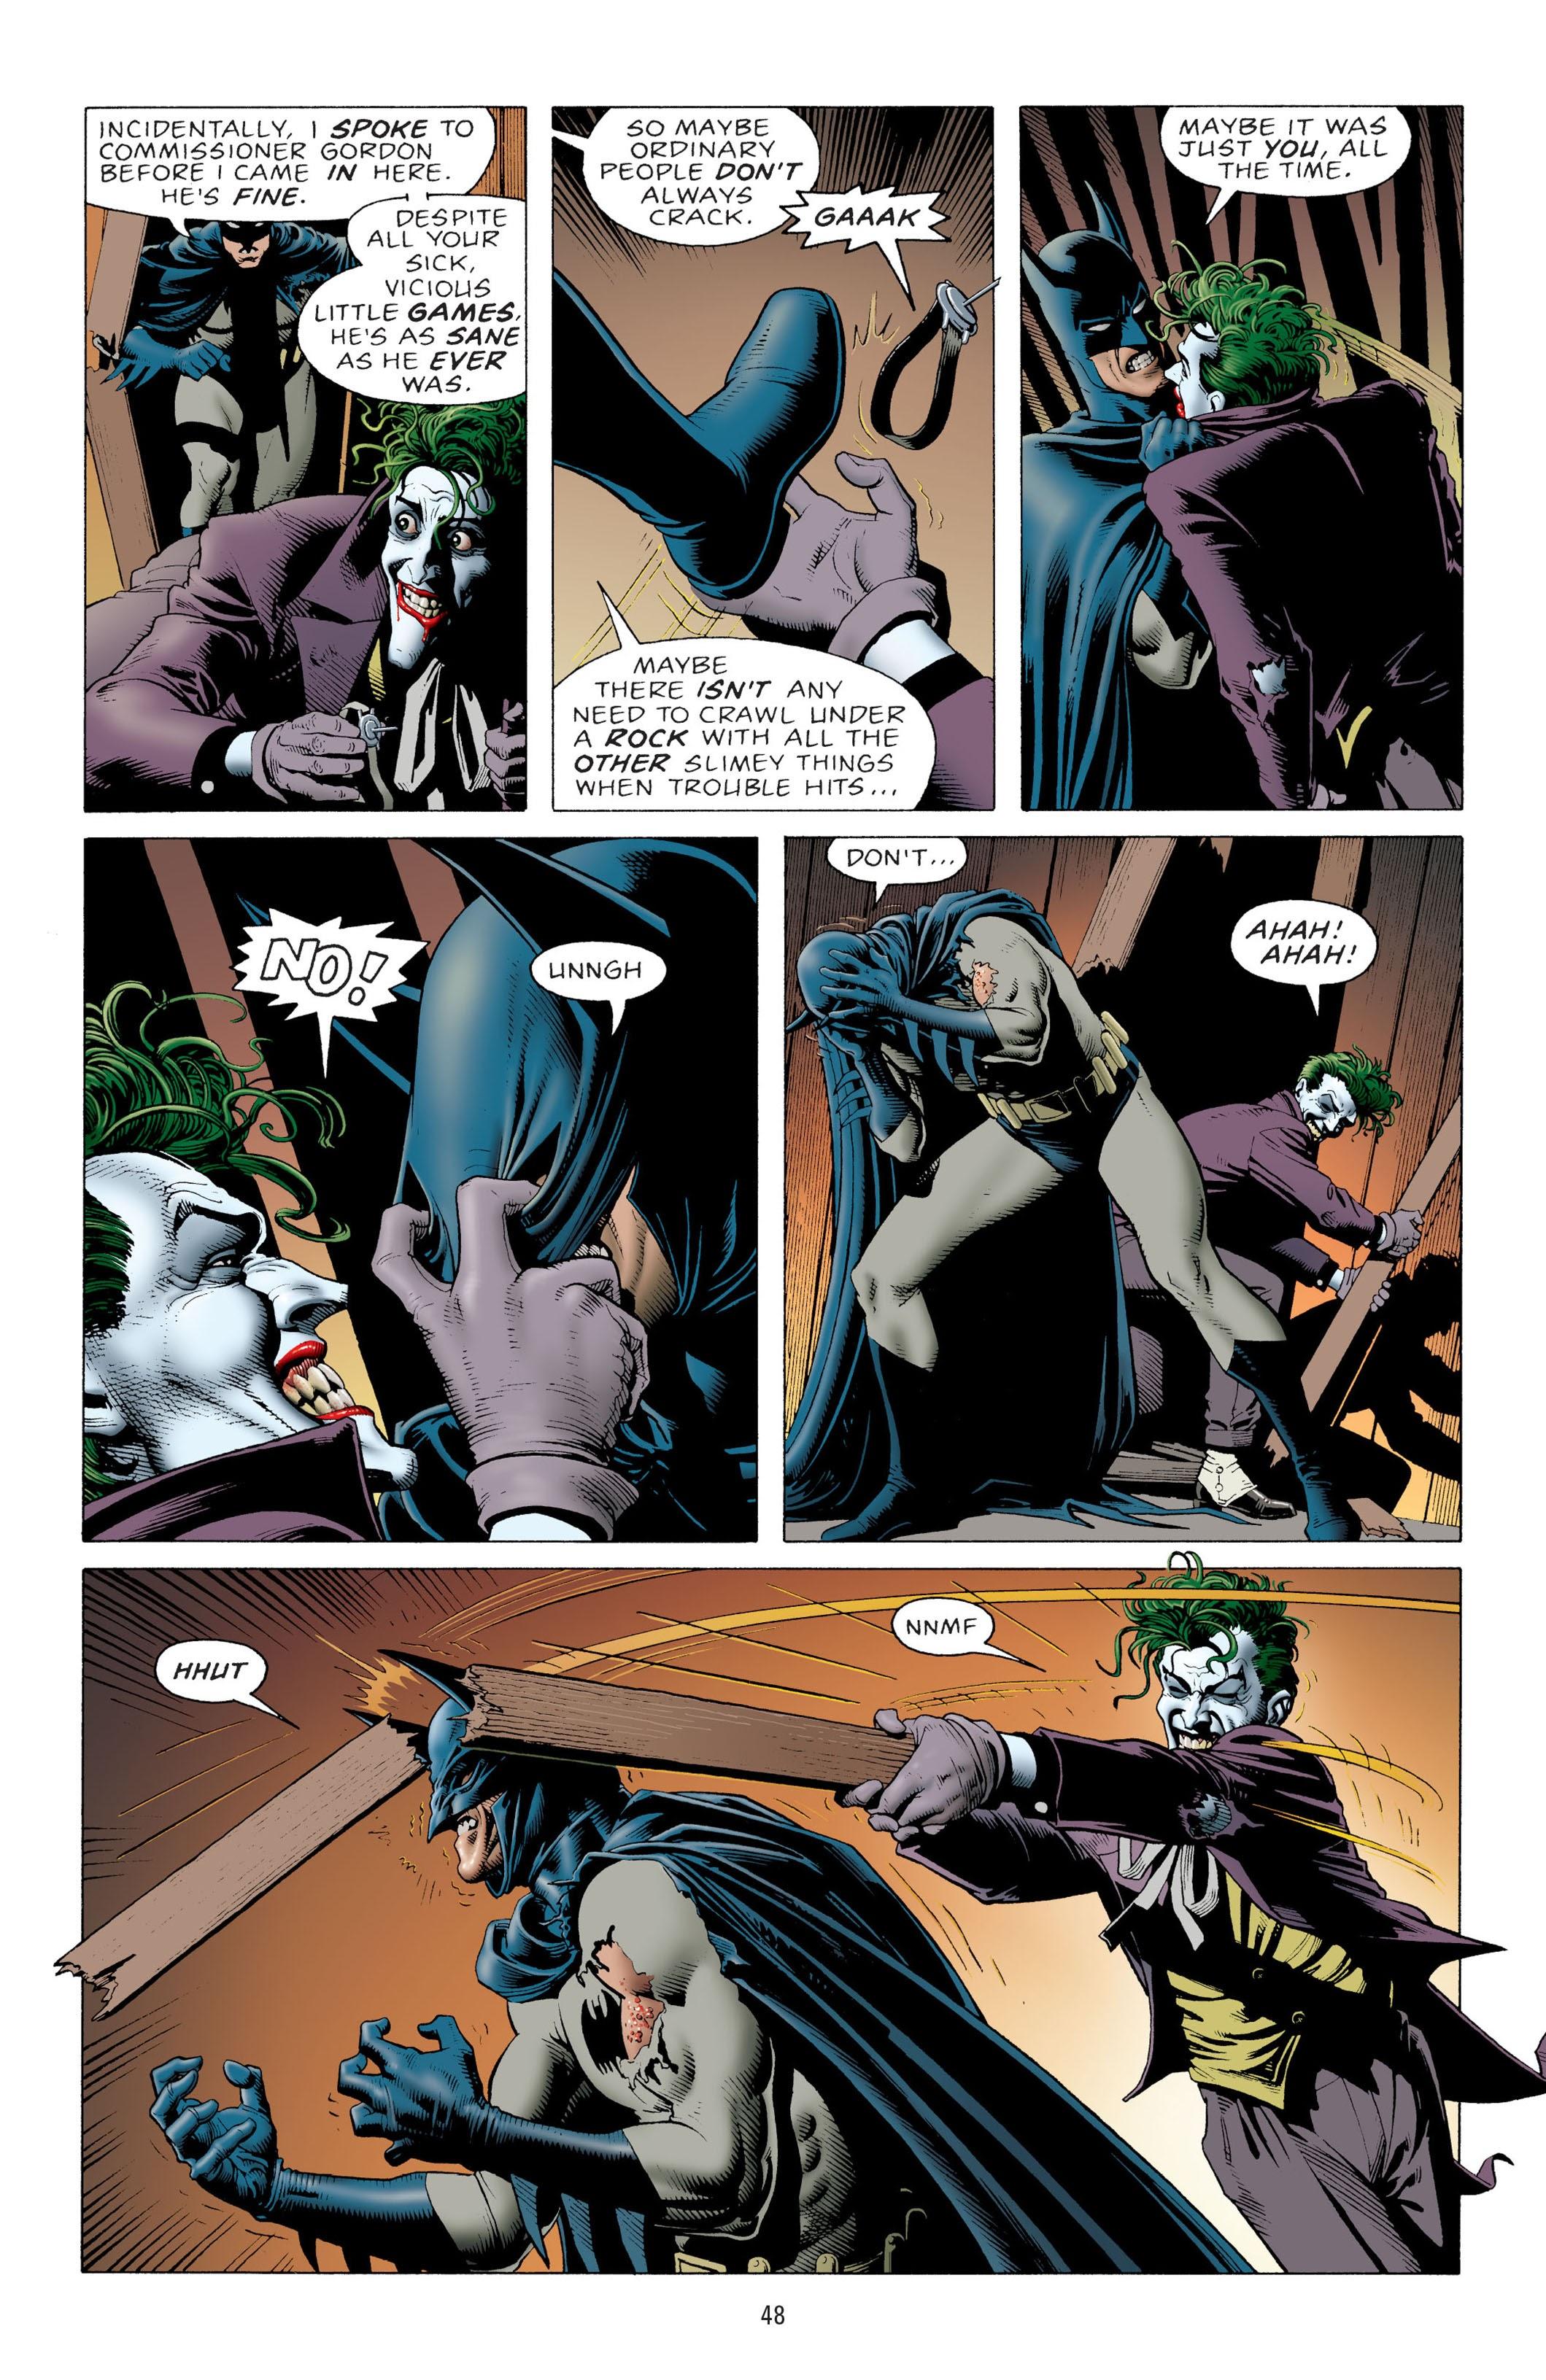 Psychology of Bruce Wayne YfTZQBgVfBxPukWc8vmw6txzeKmDgmWsBKOxPBfD5mabs54IE6FCSLwqFFJQ4V5YojWvqFMEgUuMyPnjmcczfjKFcdmrJJfIzee2UAGg7i9Ndf3iWQndih0BRAatb9_A1AGC54YtNA=s0